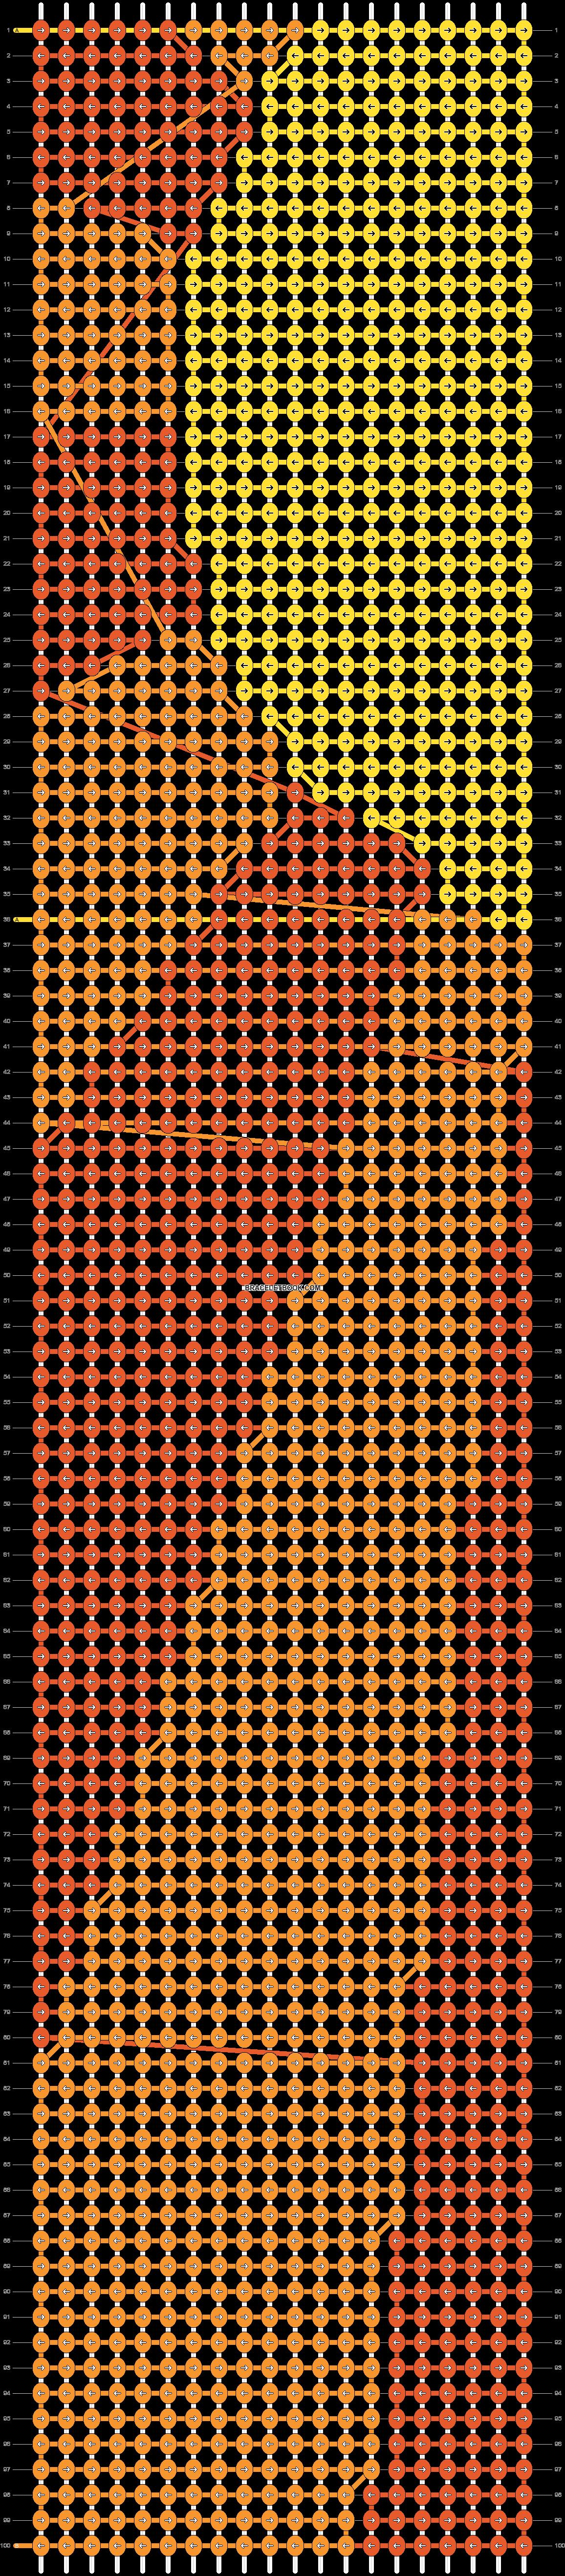 Alpha Pattern #22464 added by kbhend9715